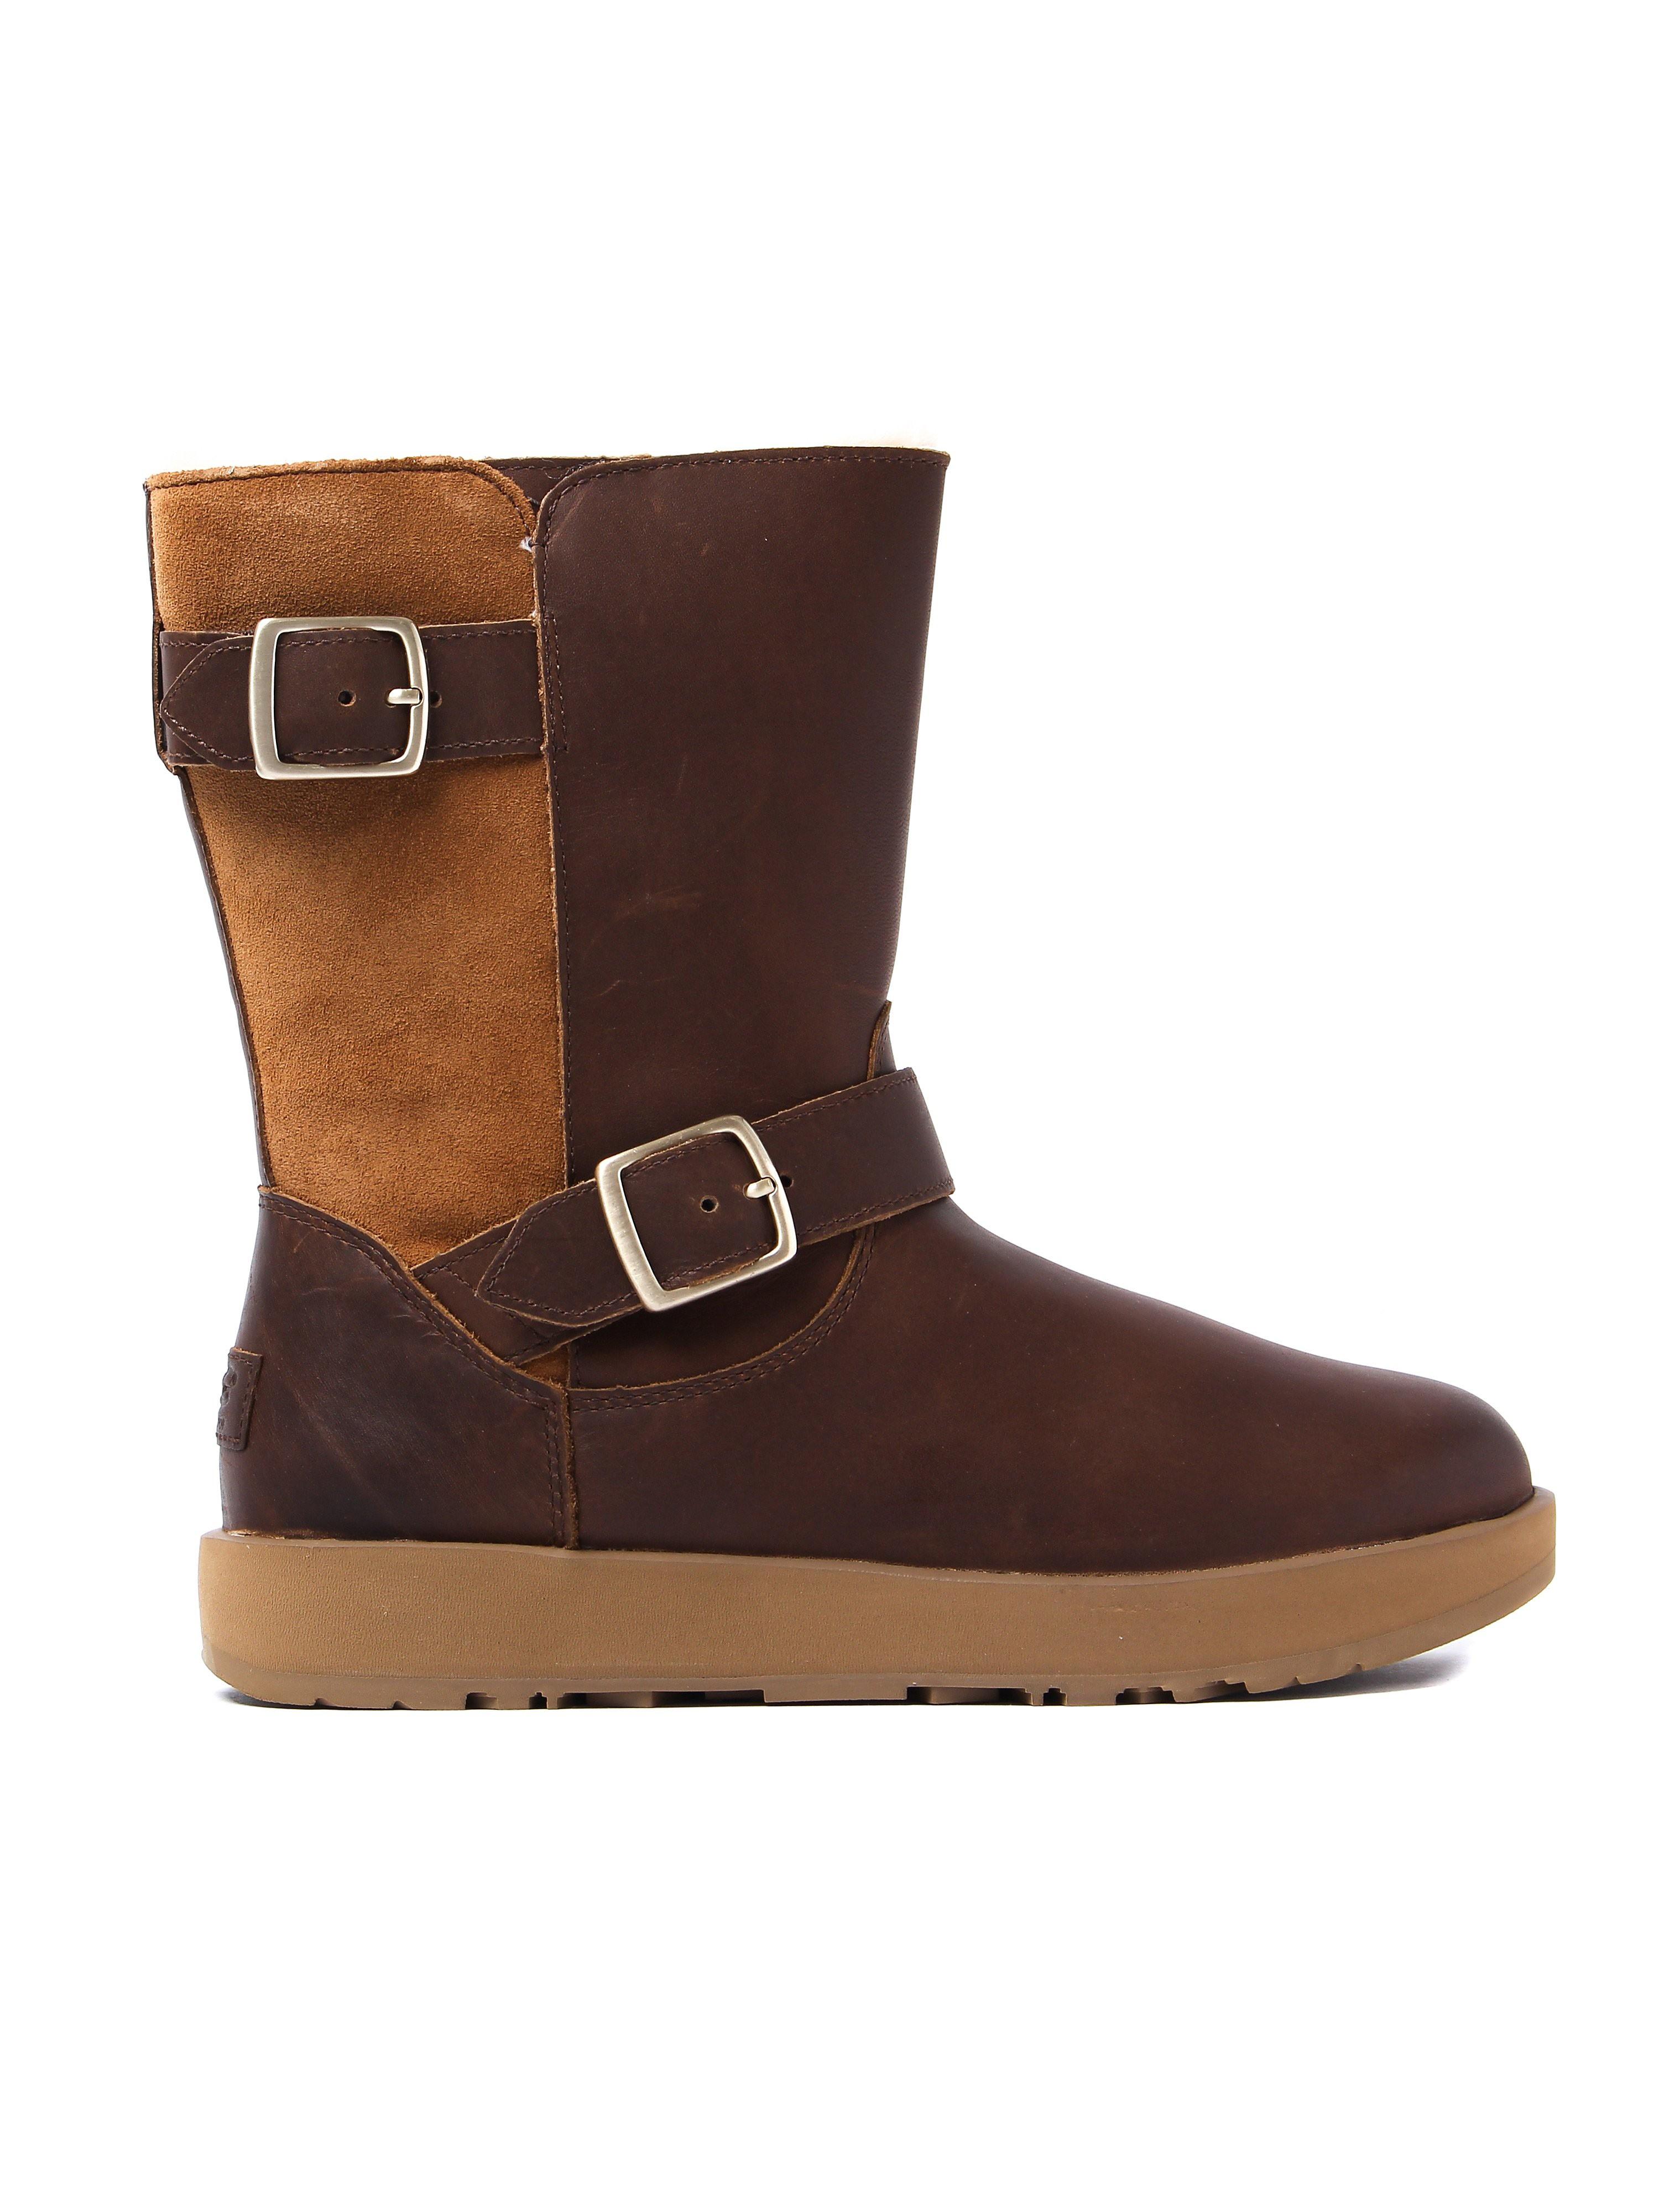 UGG Women's Waterproof Breida Boots - Chestnut Leather